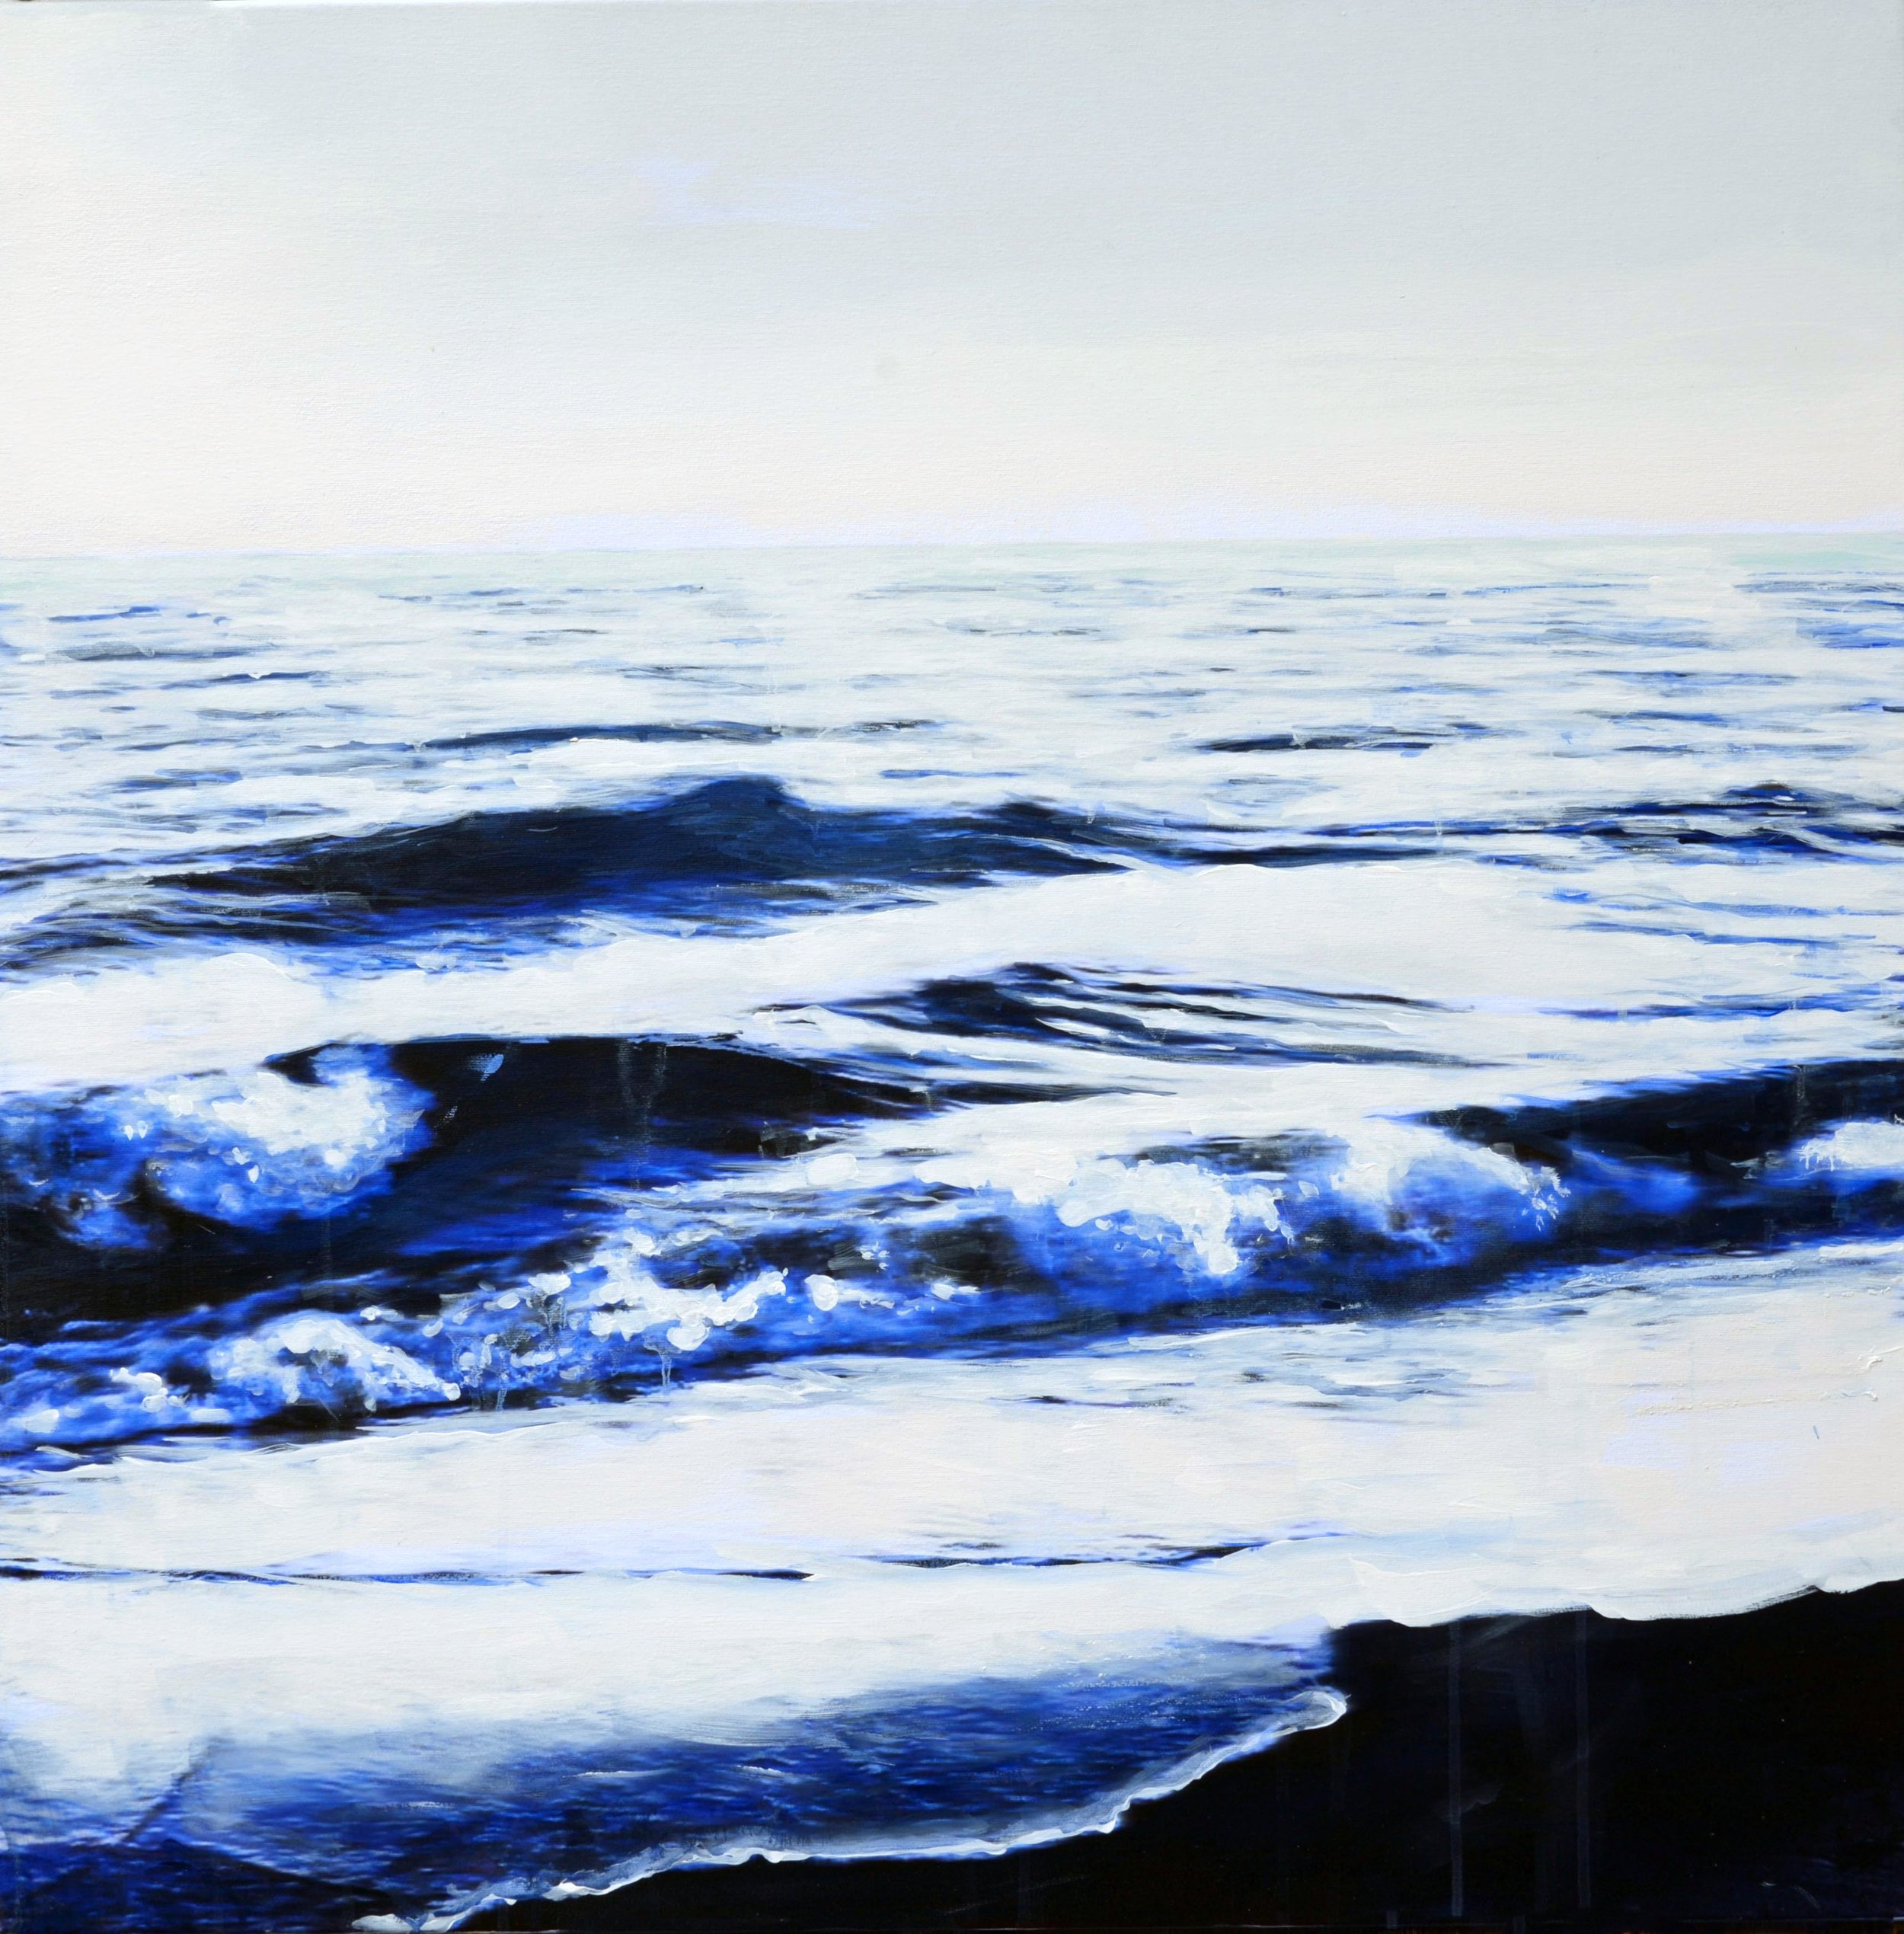 Bue waves